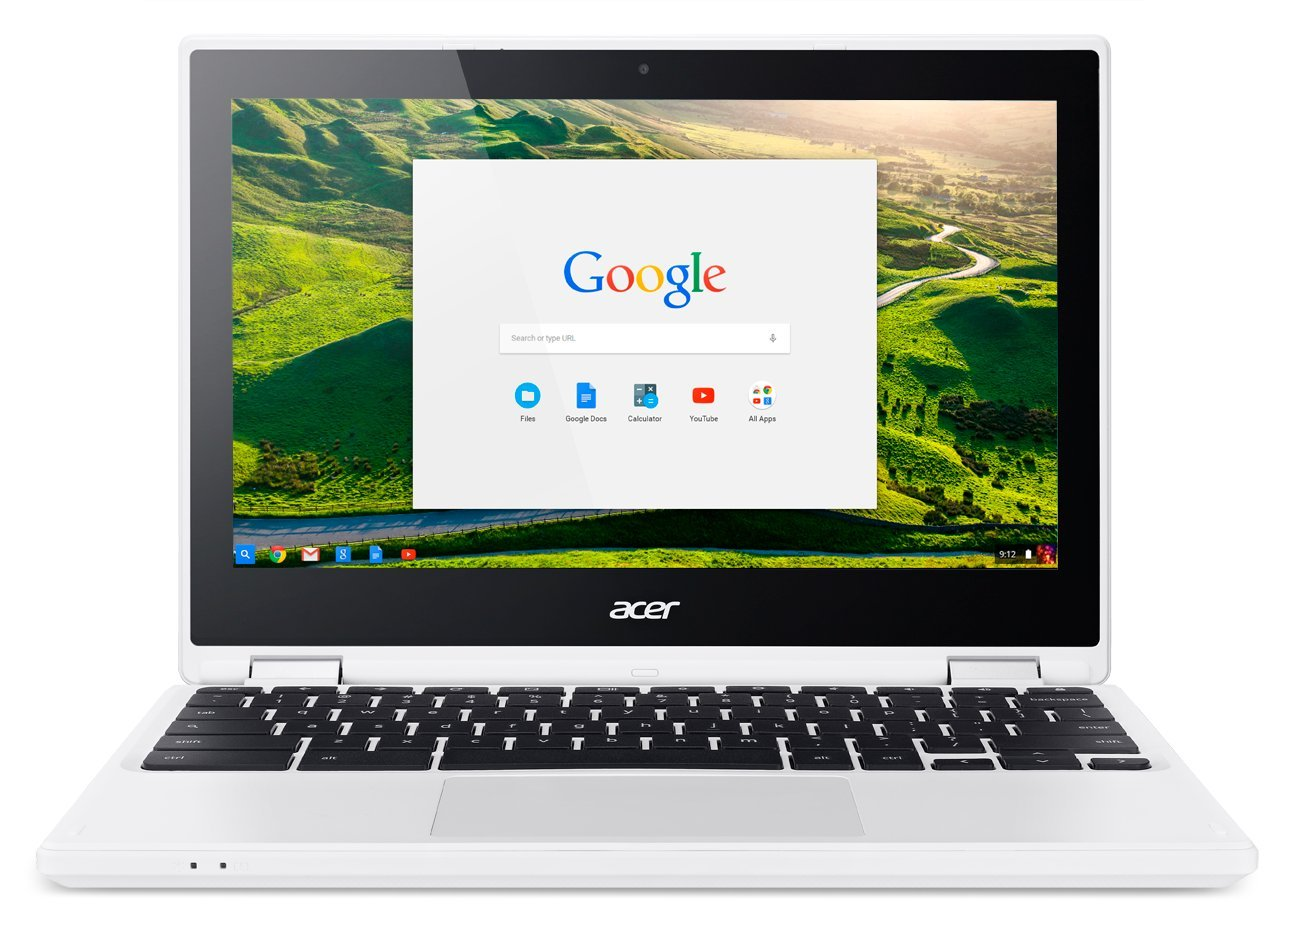 Chromebook CTL J4+ Quad Core Arm 1.8 Ghz RK3288 - 4GB DDR3L/16GB EMMC